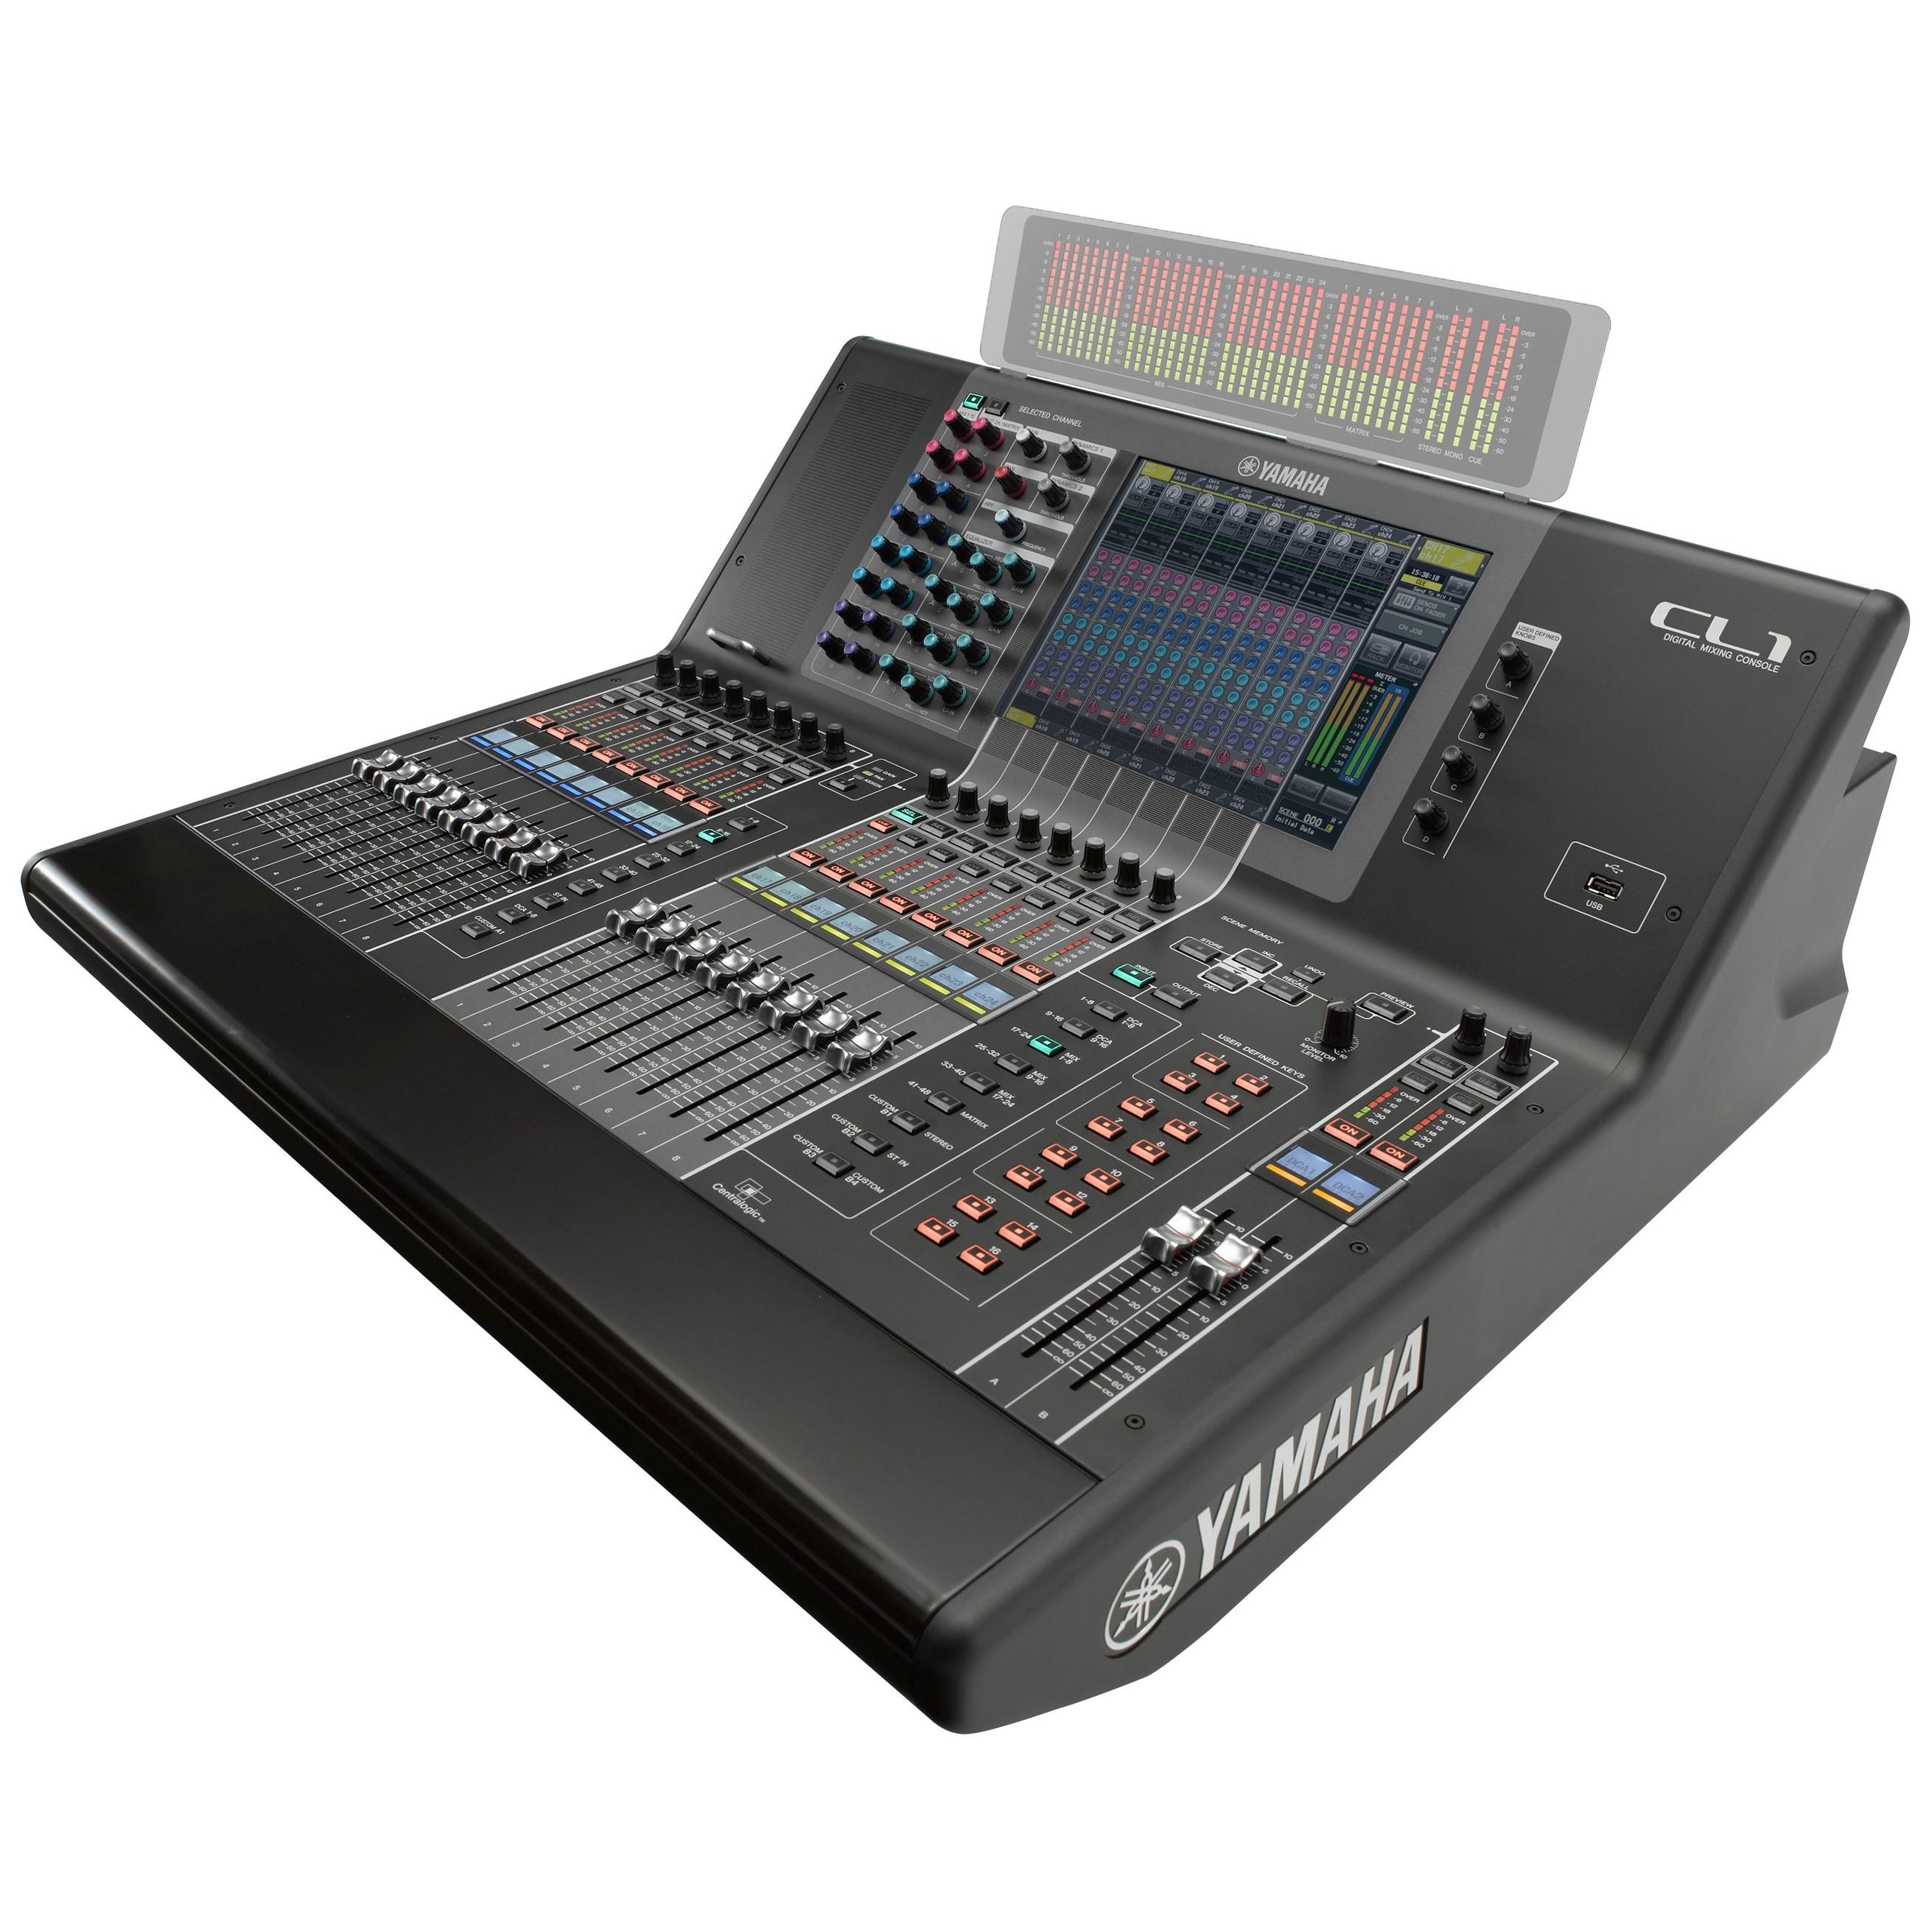 yamaha cl1 digital mixing console. Black Bedroom Furniture Sets. Home Design Ideas